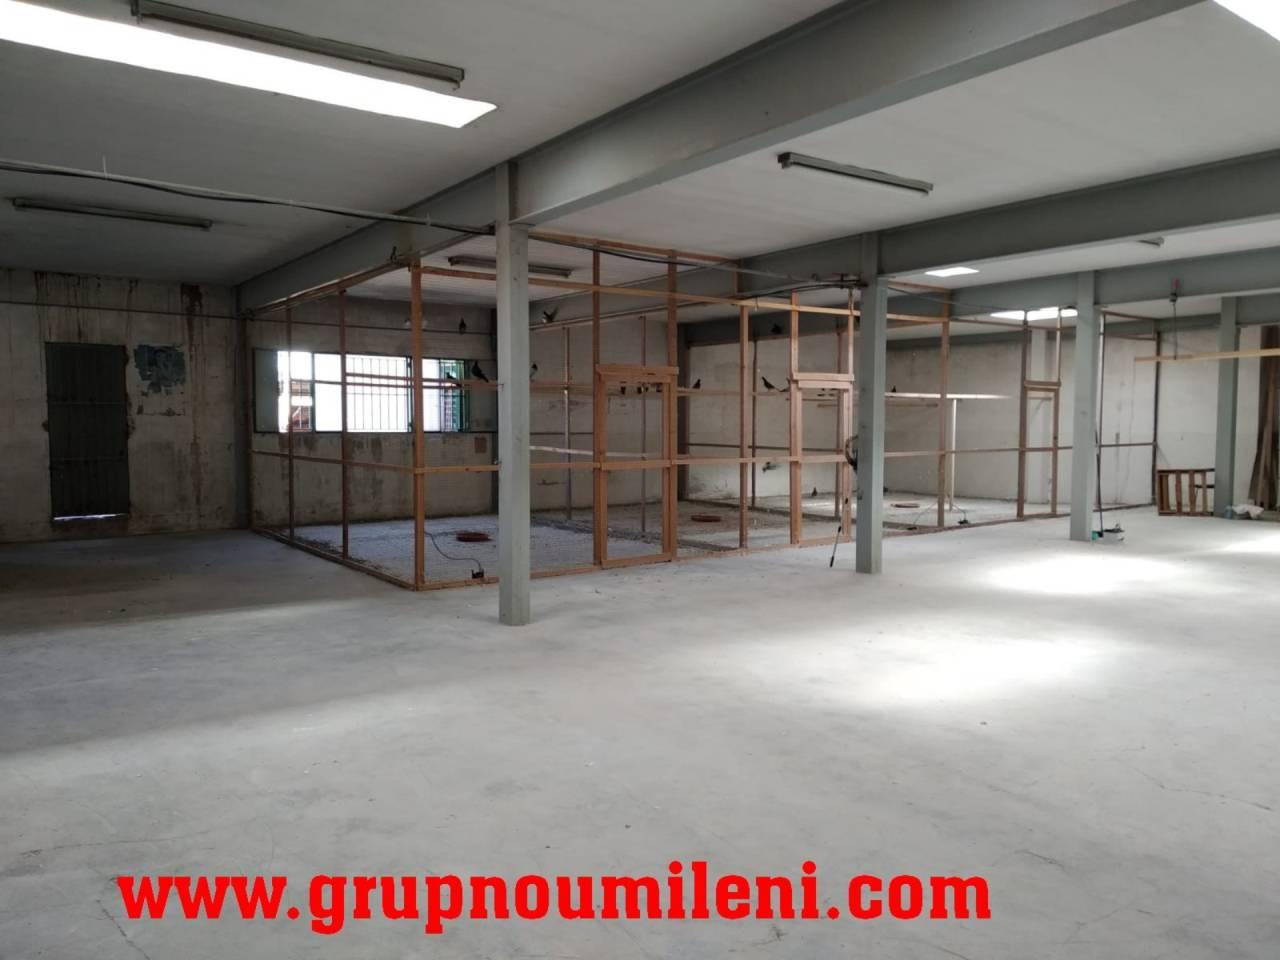 Nau industrial  Albal. Superficie total 1800 m², nave comercial superficie útil 1800 m²